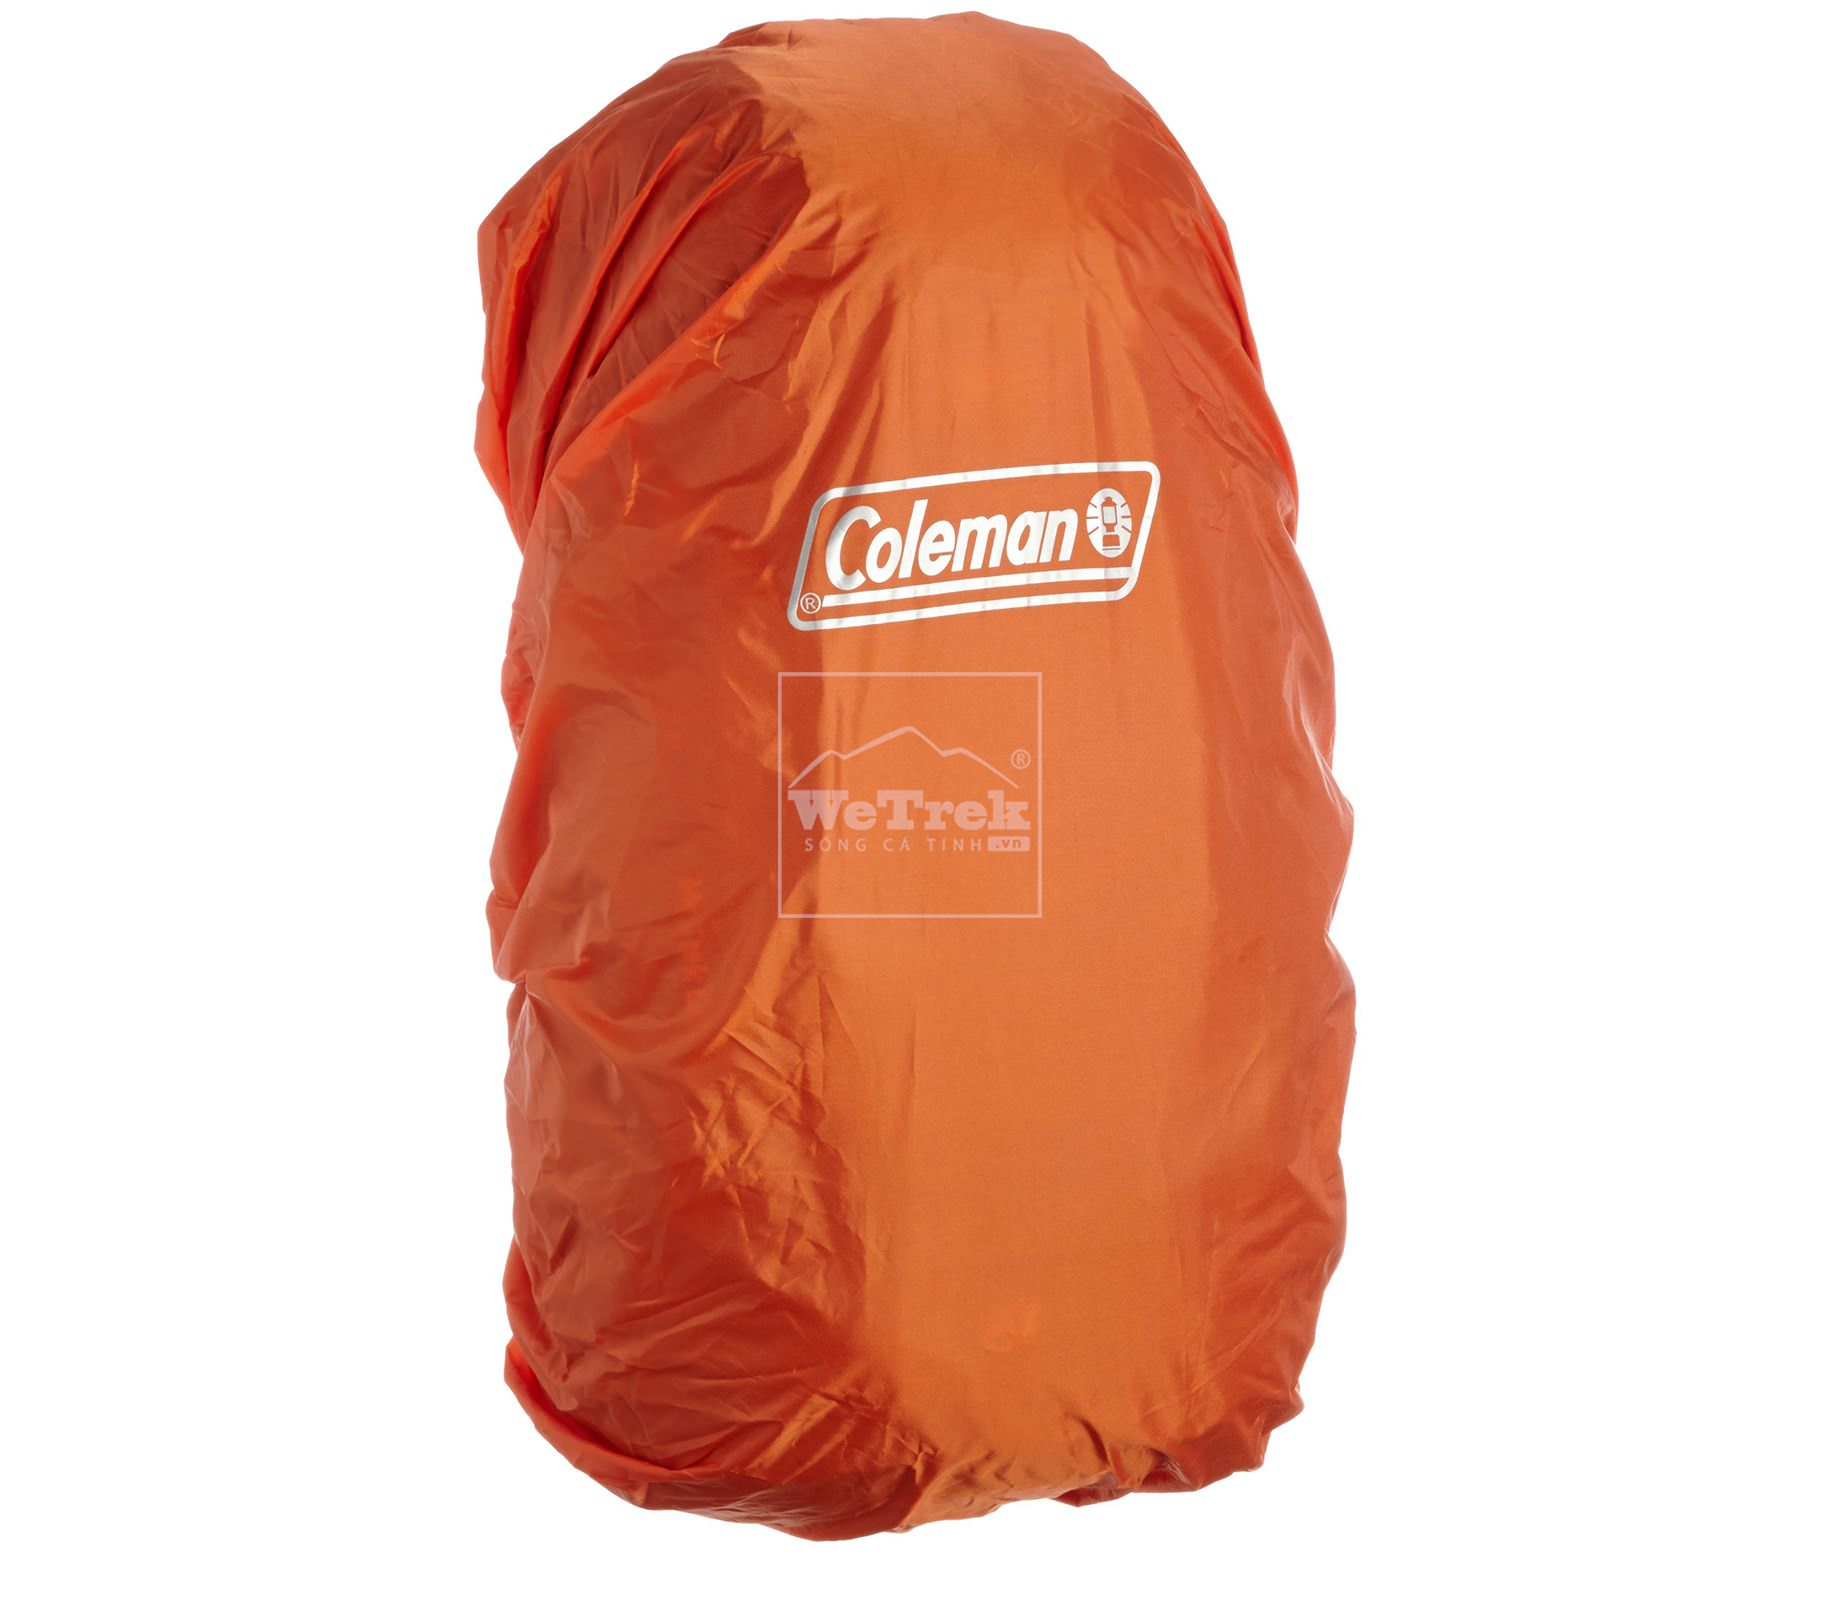 ba-lo-leo-nui-40l-coleman-mttrek-lite-backpack-green-cbb4091gr-7455-wetrek.vn-3